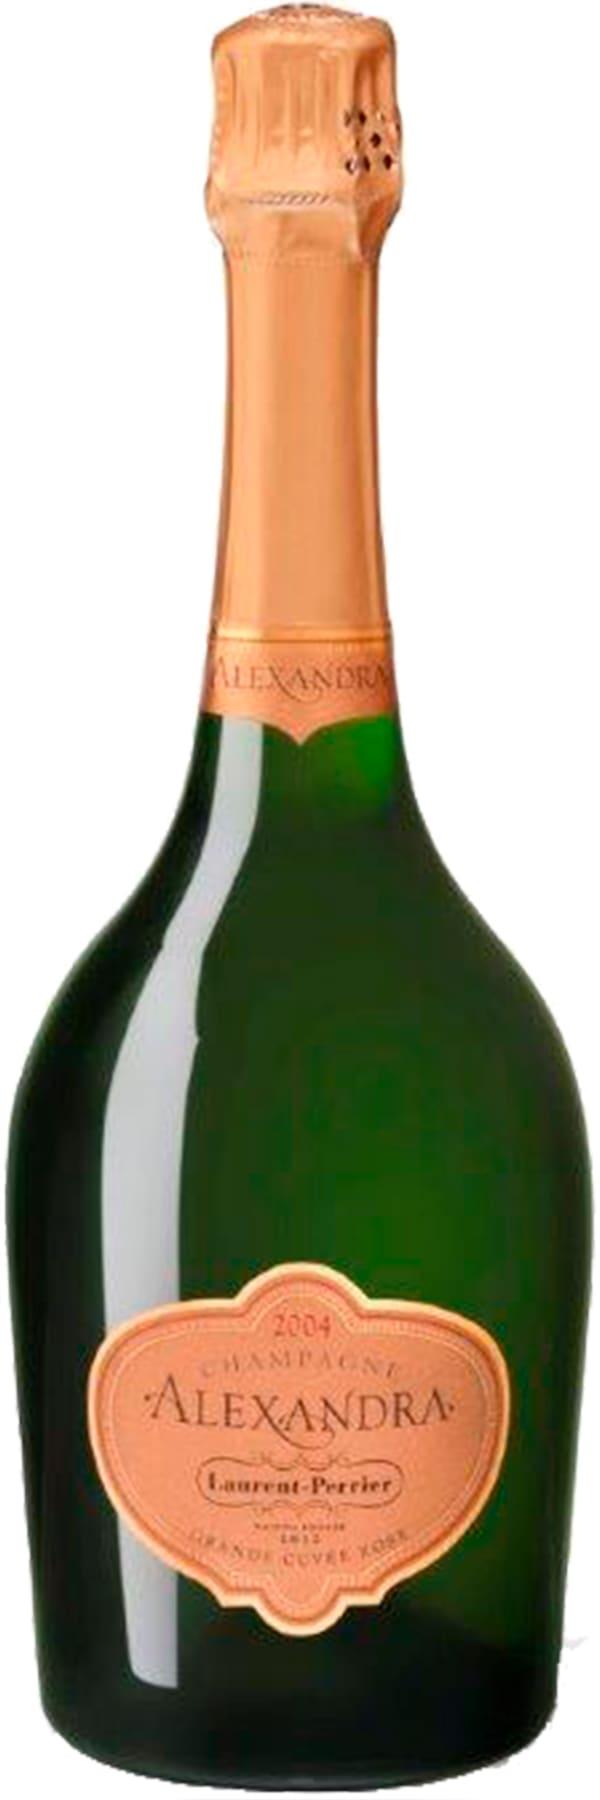 Laurent-Perrier Alexandra Grande Cuvée Rosé Champagne Brut 2004